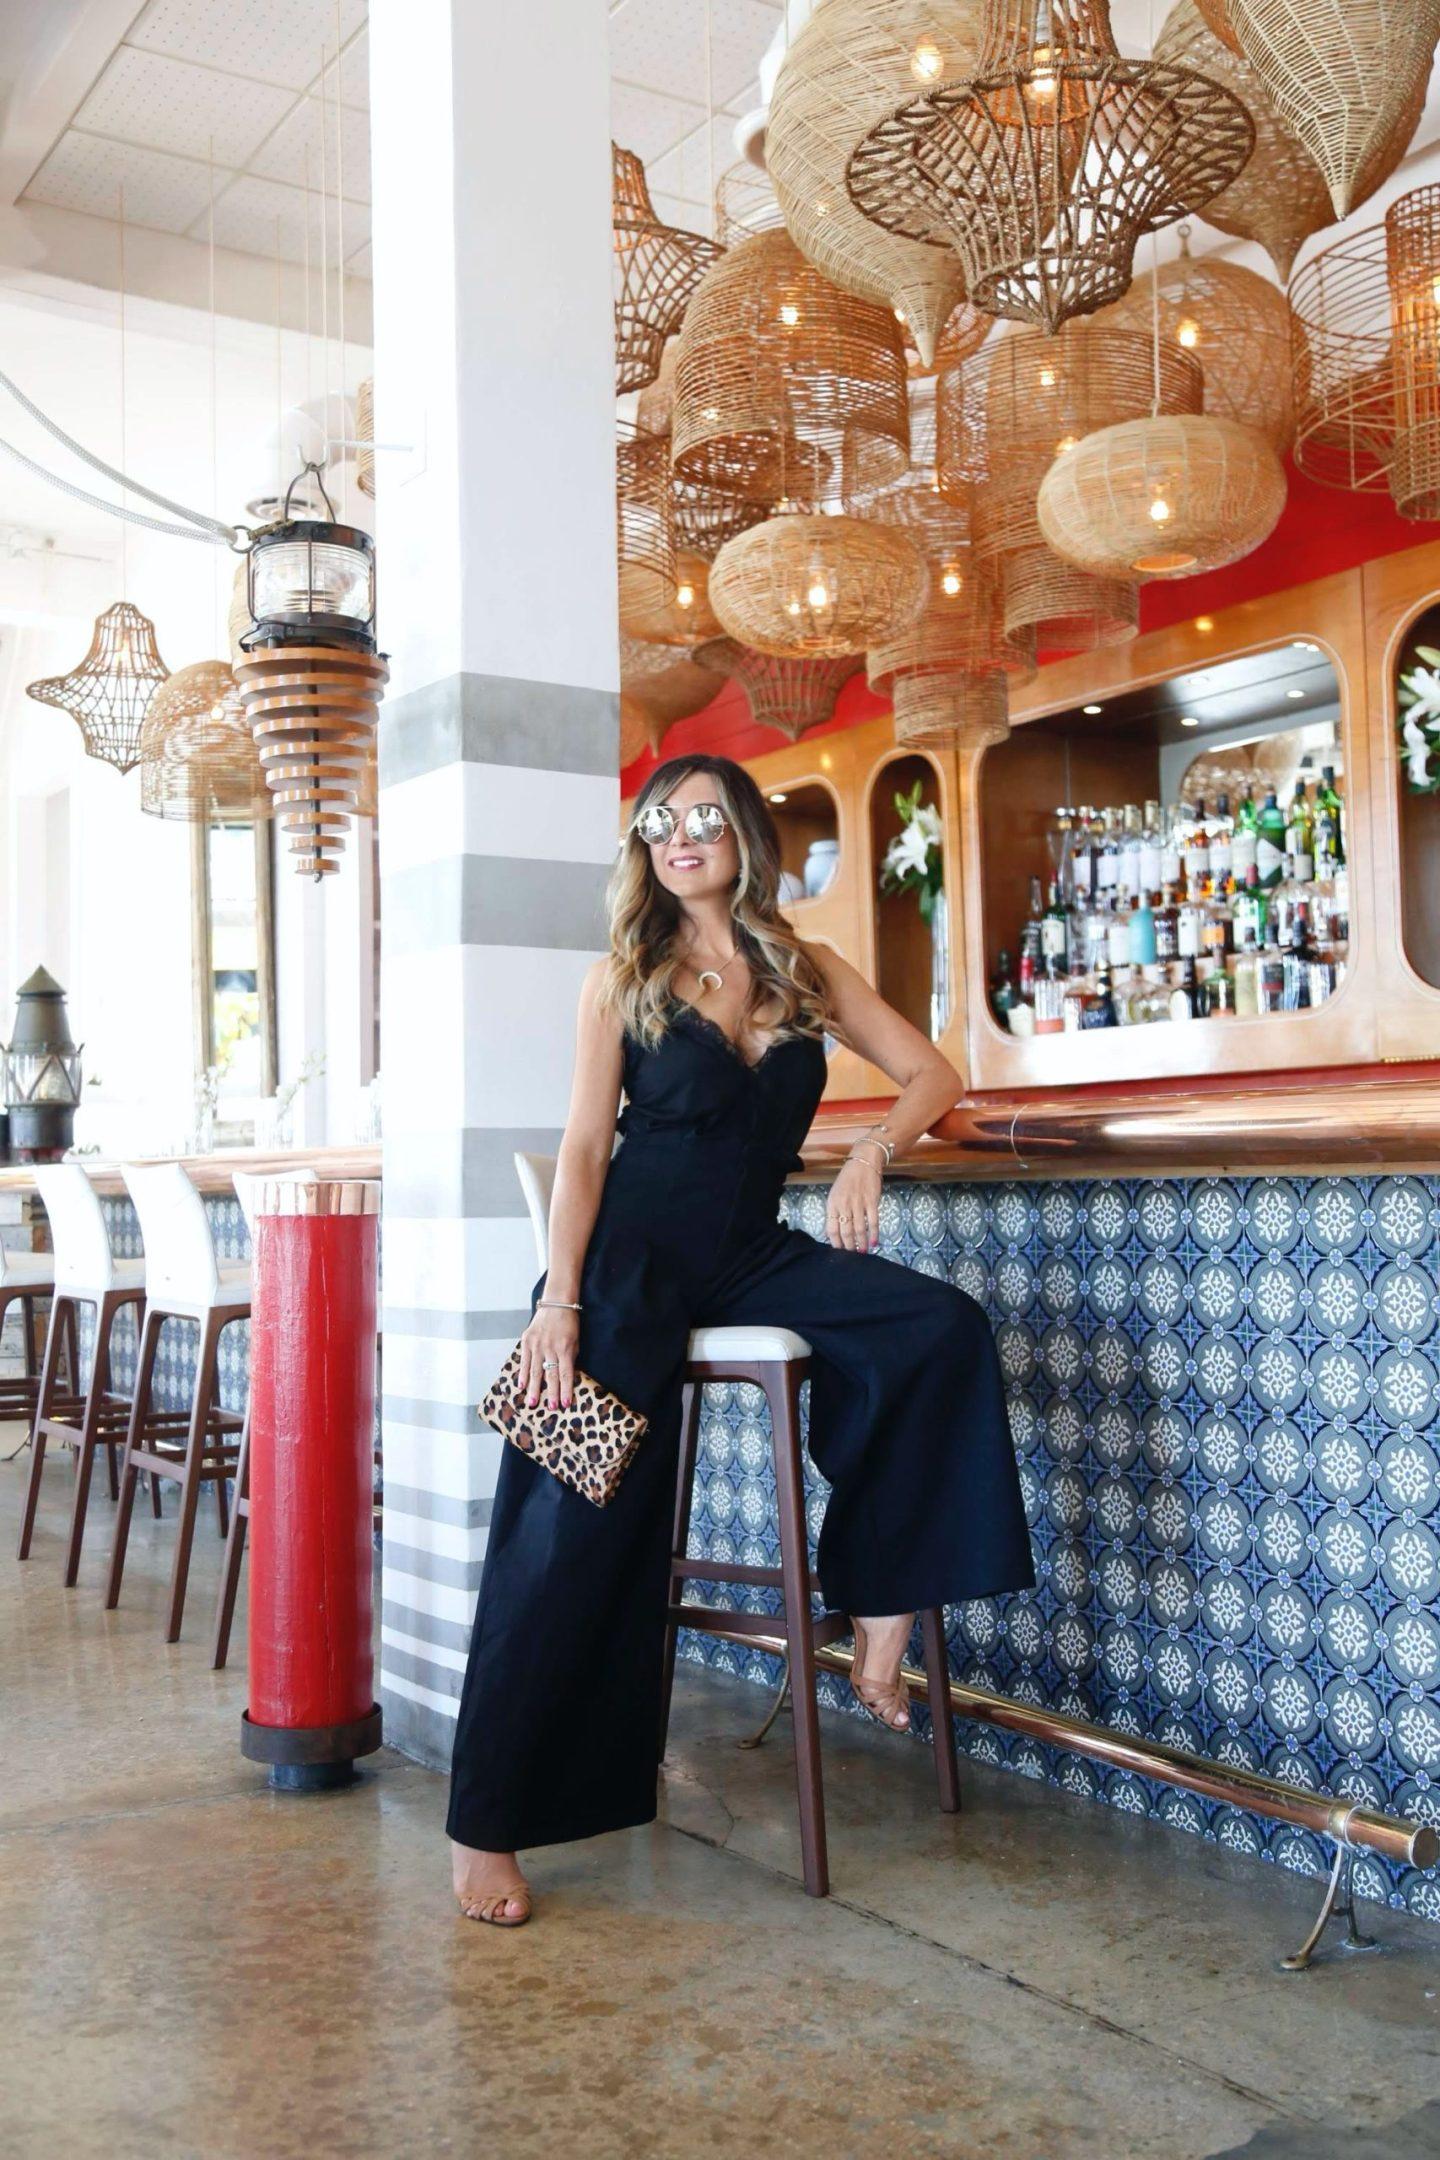 Brickellista's Favorite Local Miami Happy Hour Hot Spots